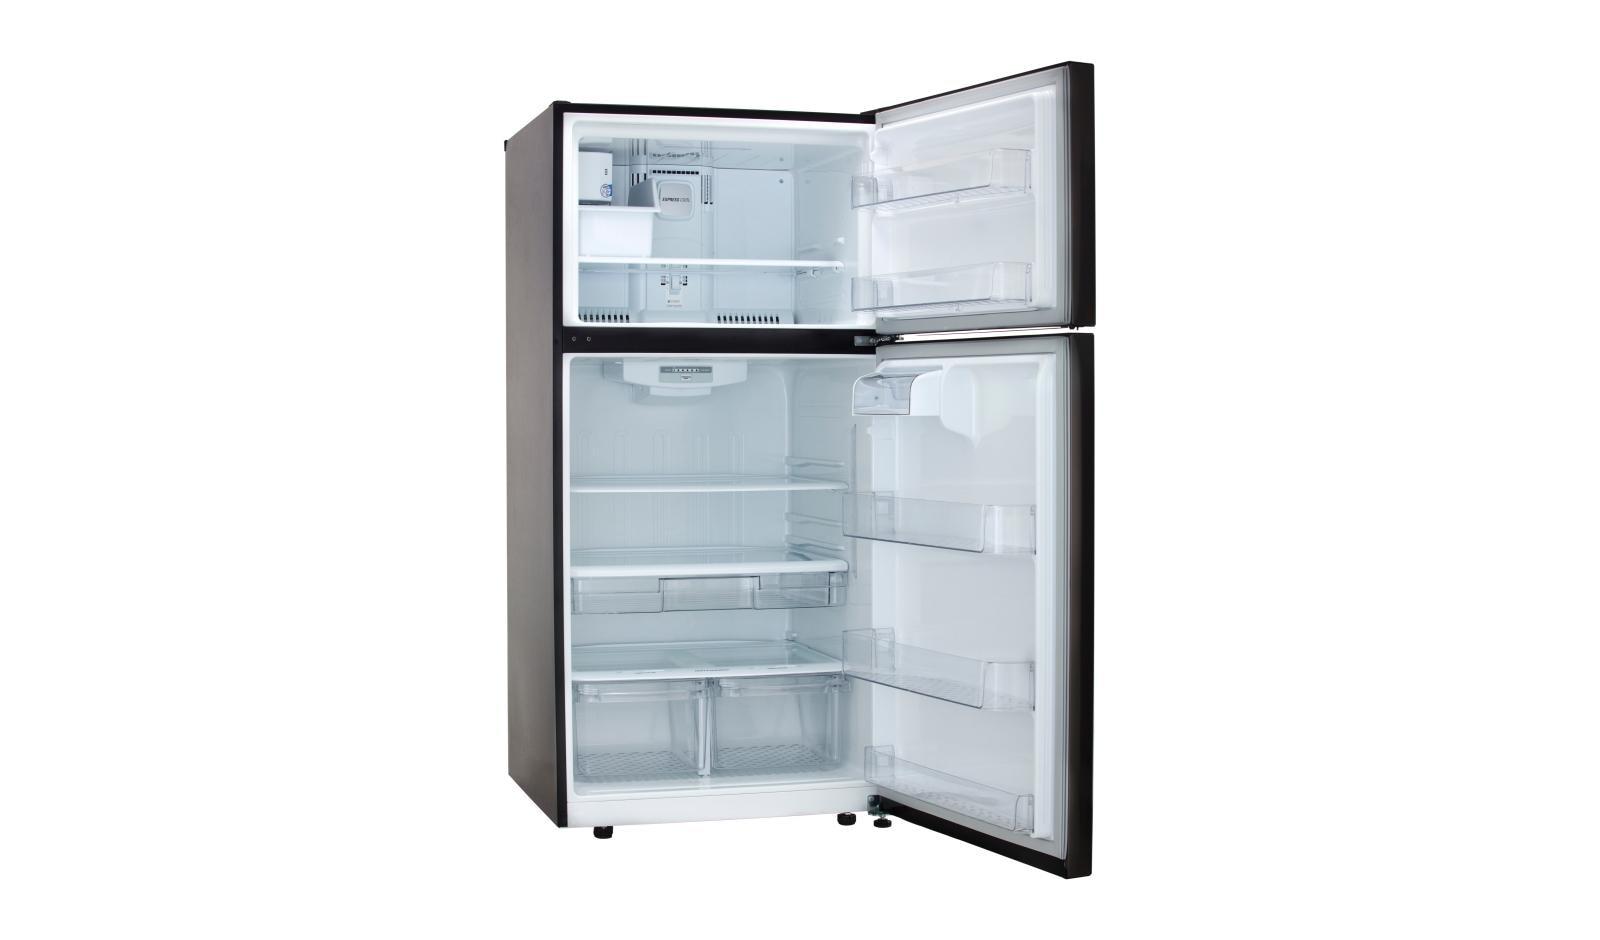 LG LTCS24223D: Black Stainless Steel Top Freezer Refrigerator | LG USA